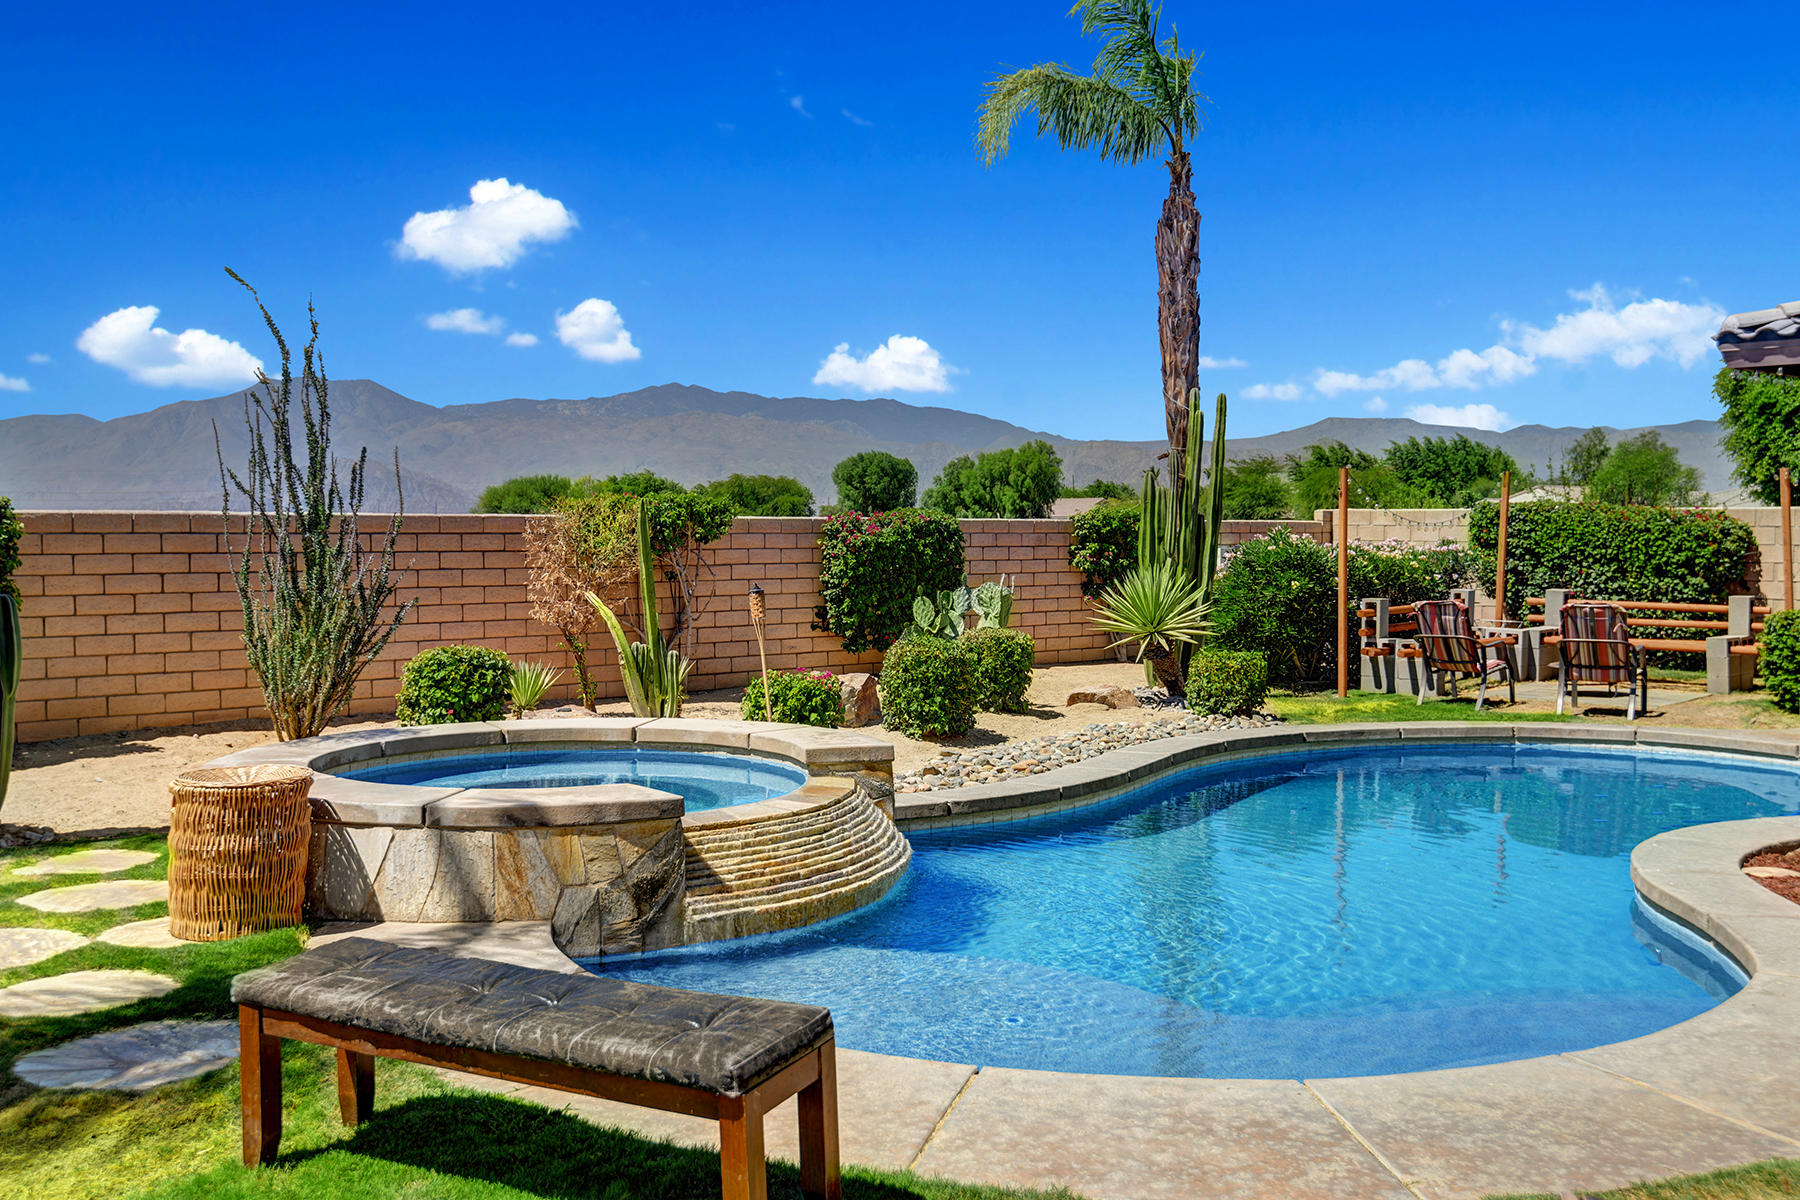 Photo of 81817 Villa Reale Drive, Indio, CA 92203